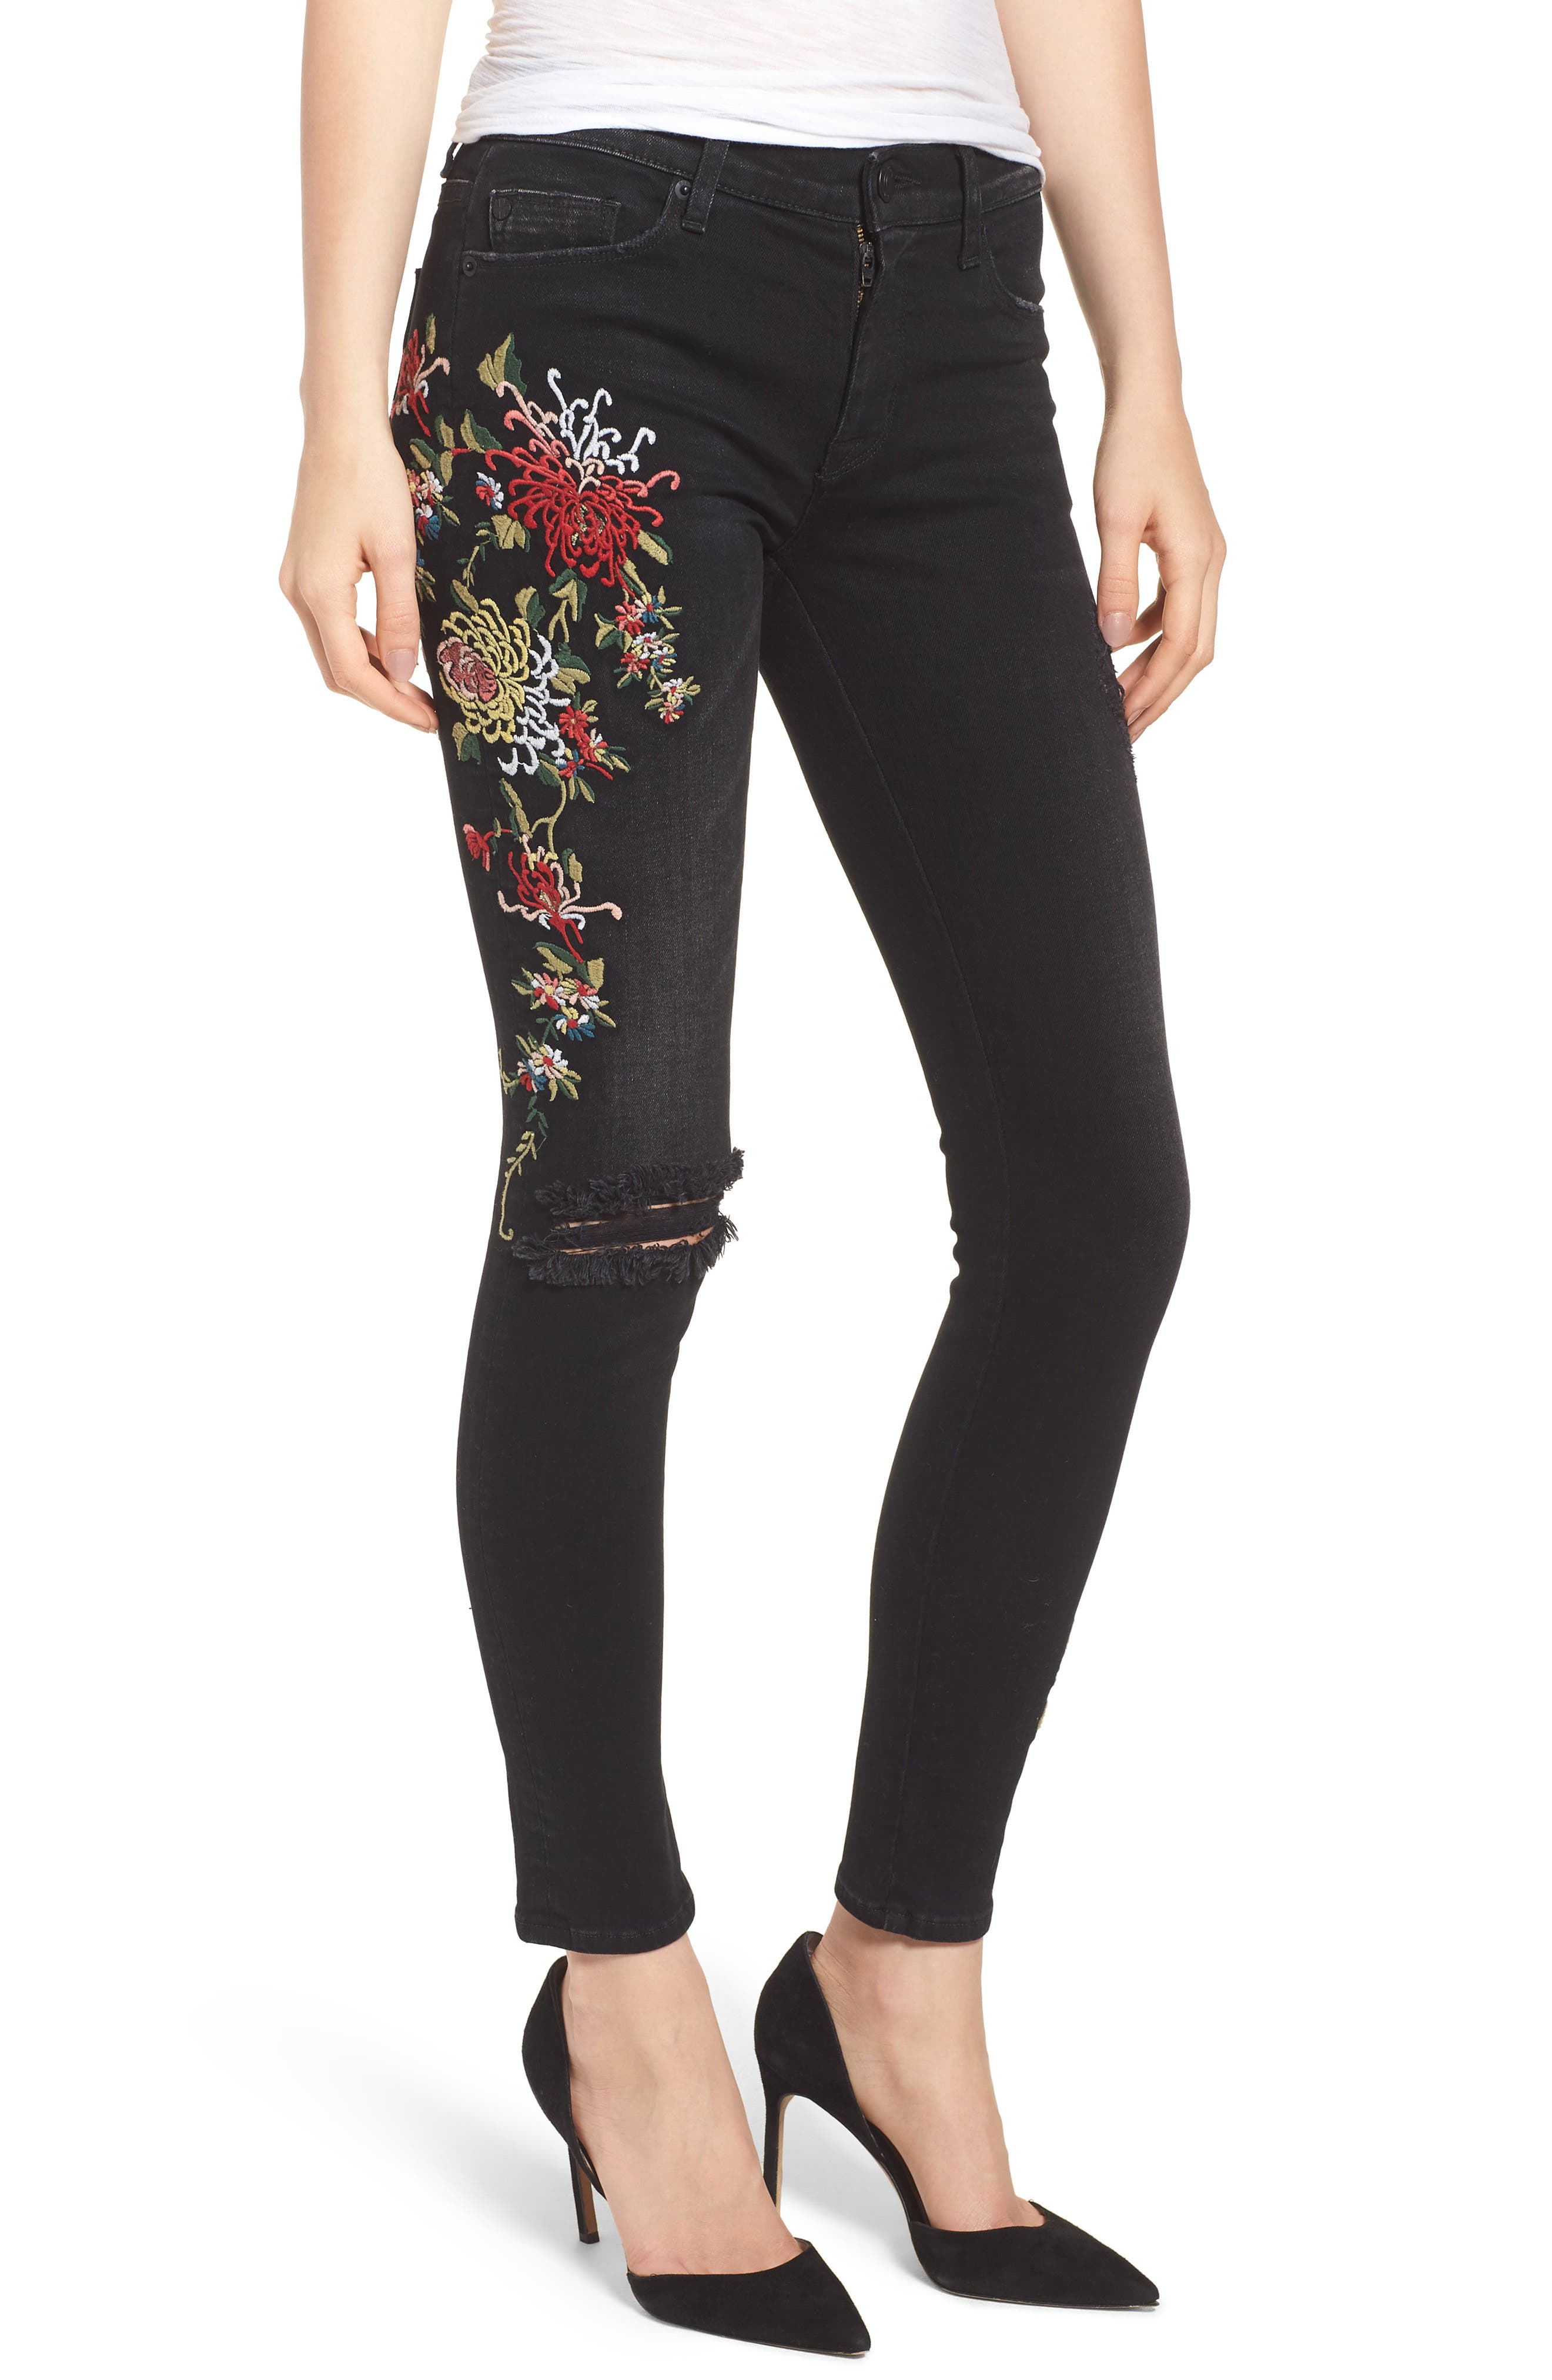 Main Image - Hudson Jeans Nico Ankle Skinny Jeans (Noir Floret)